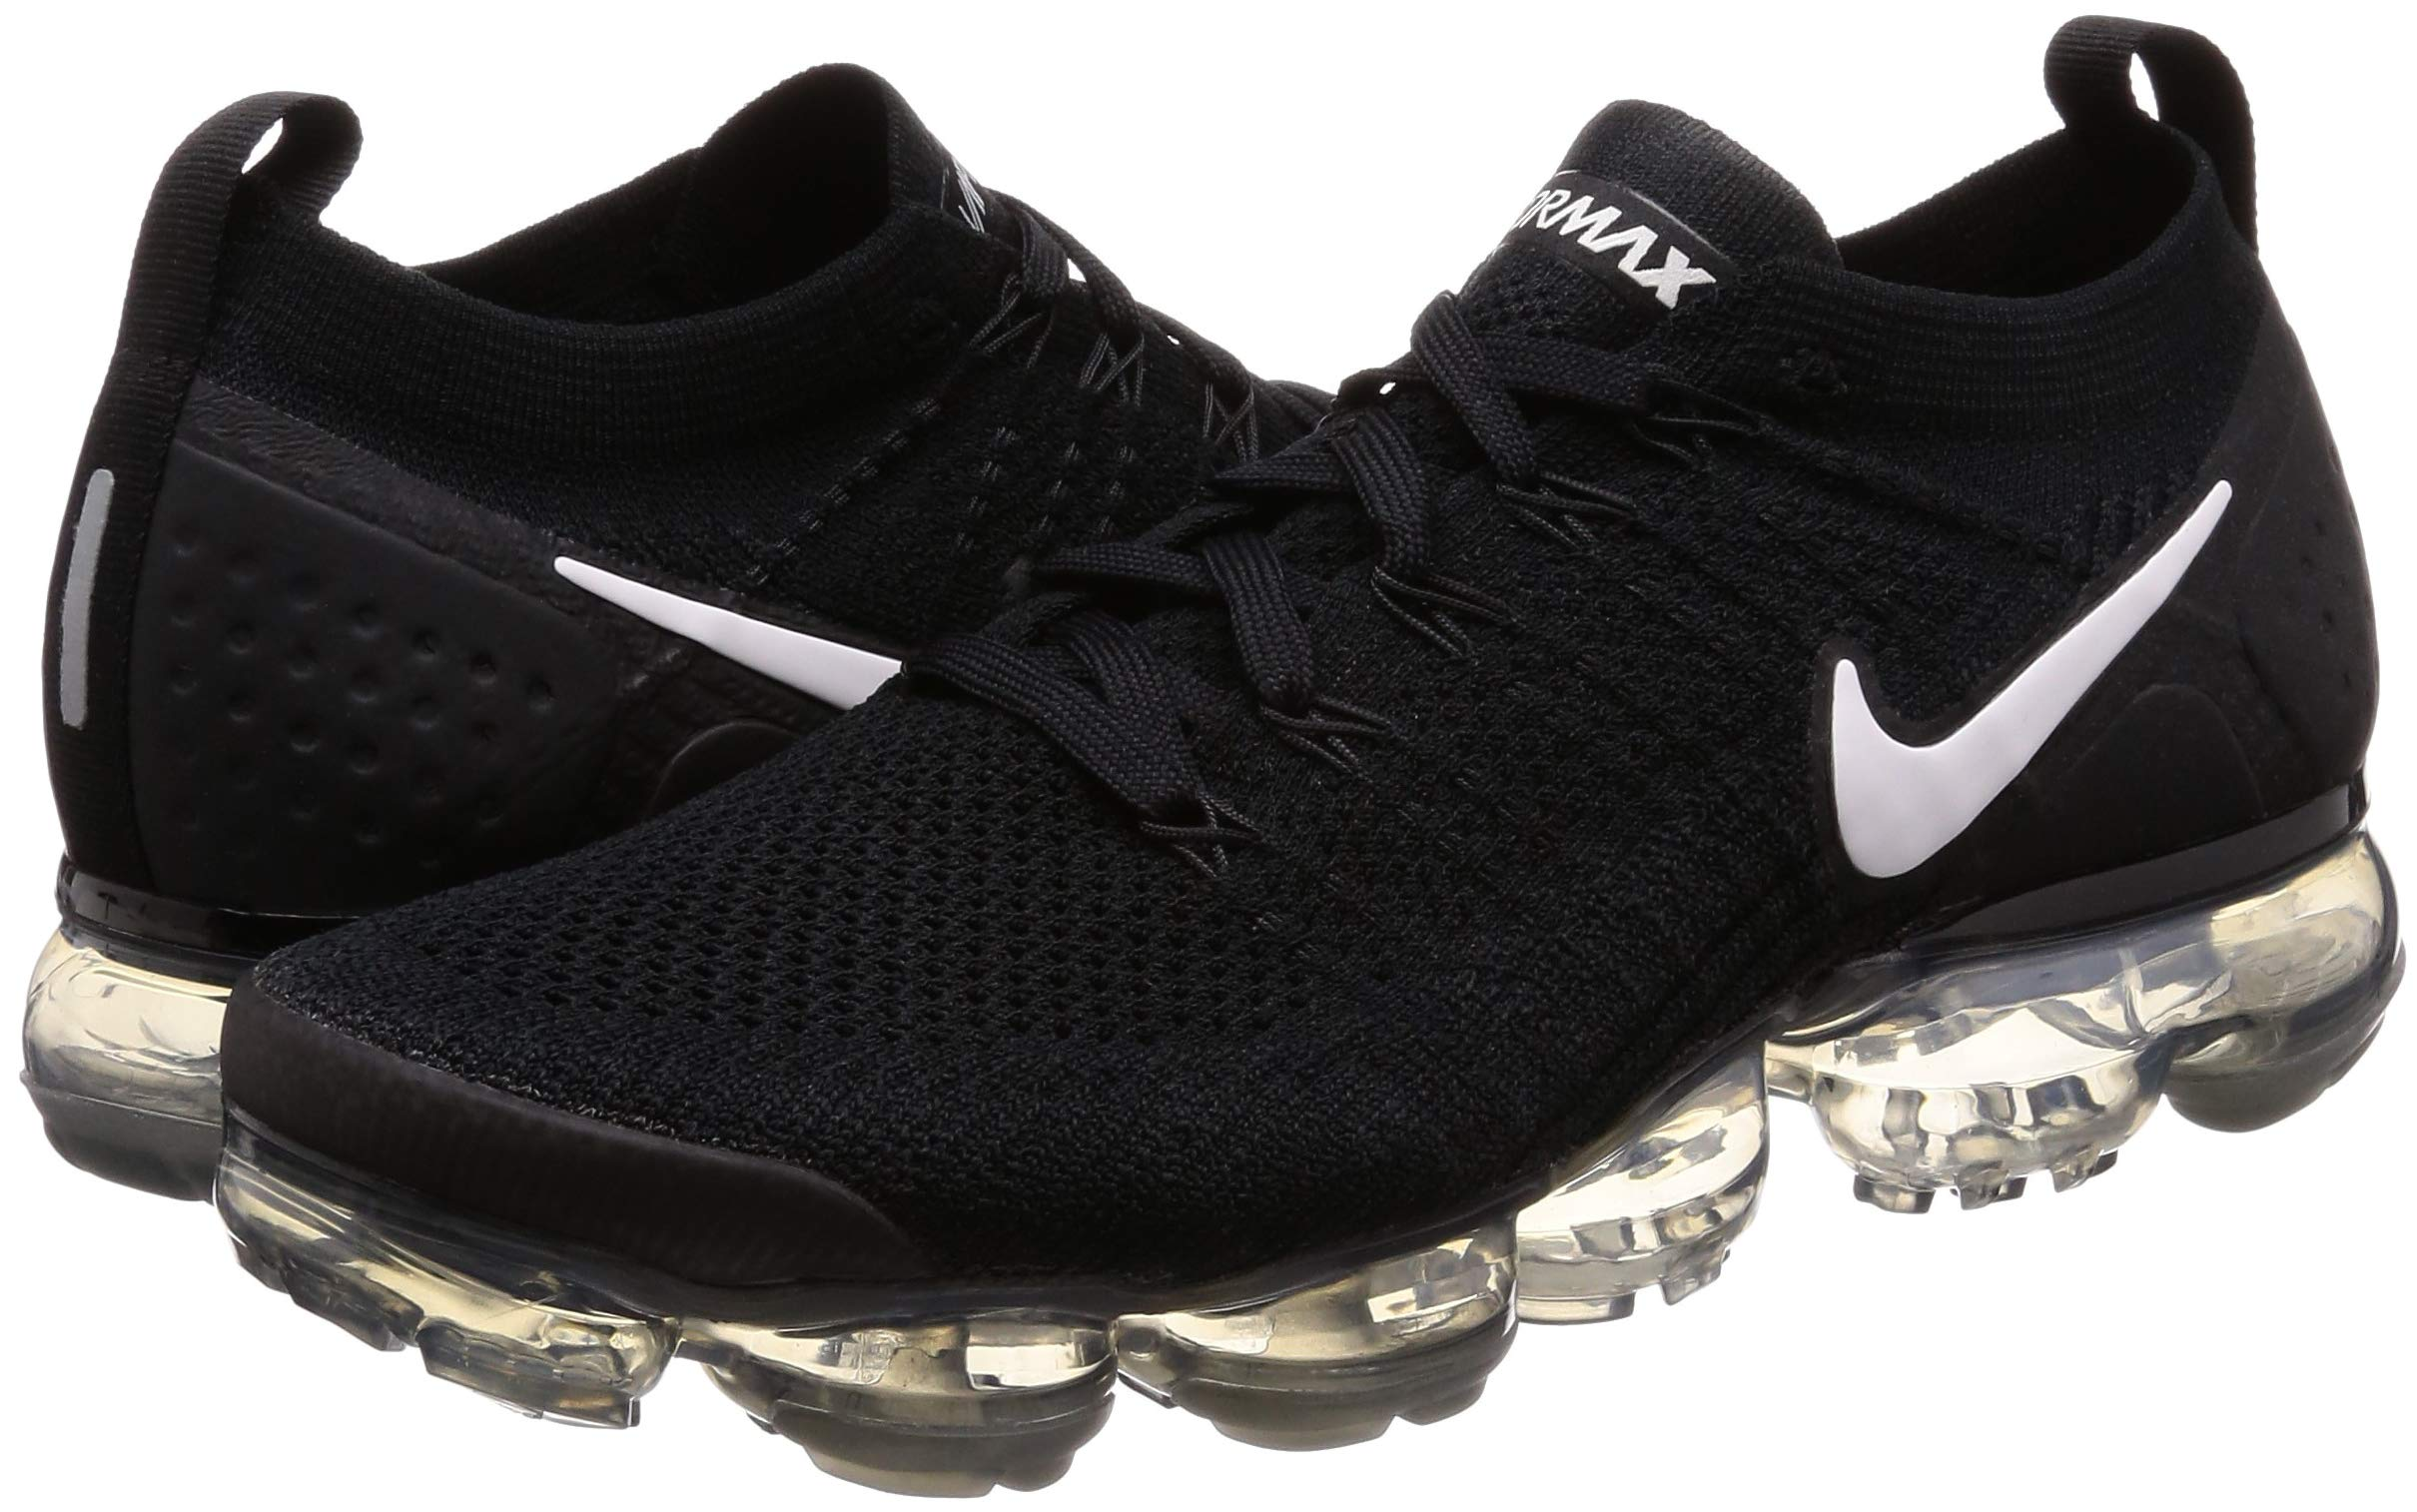 81l2ncH9 mL - Nike Men's Air Vapormax Flyknit 2 Low-Top Sneakers